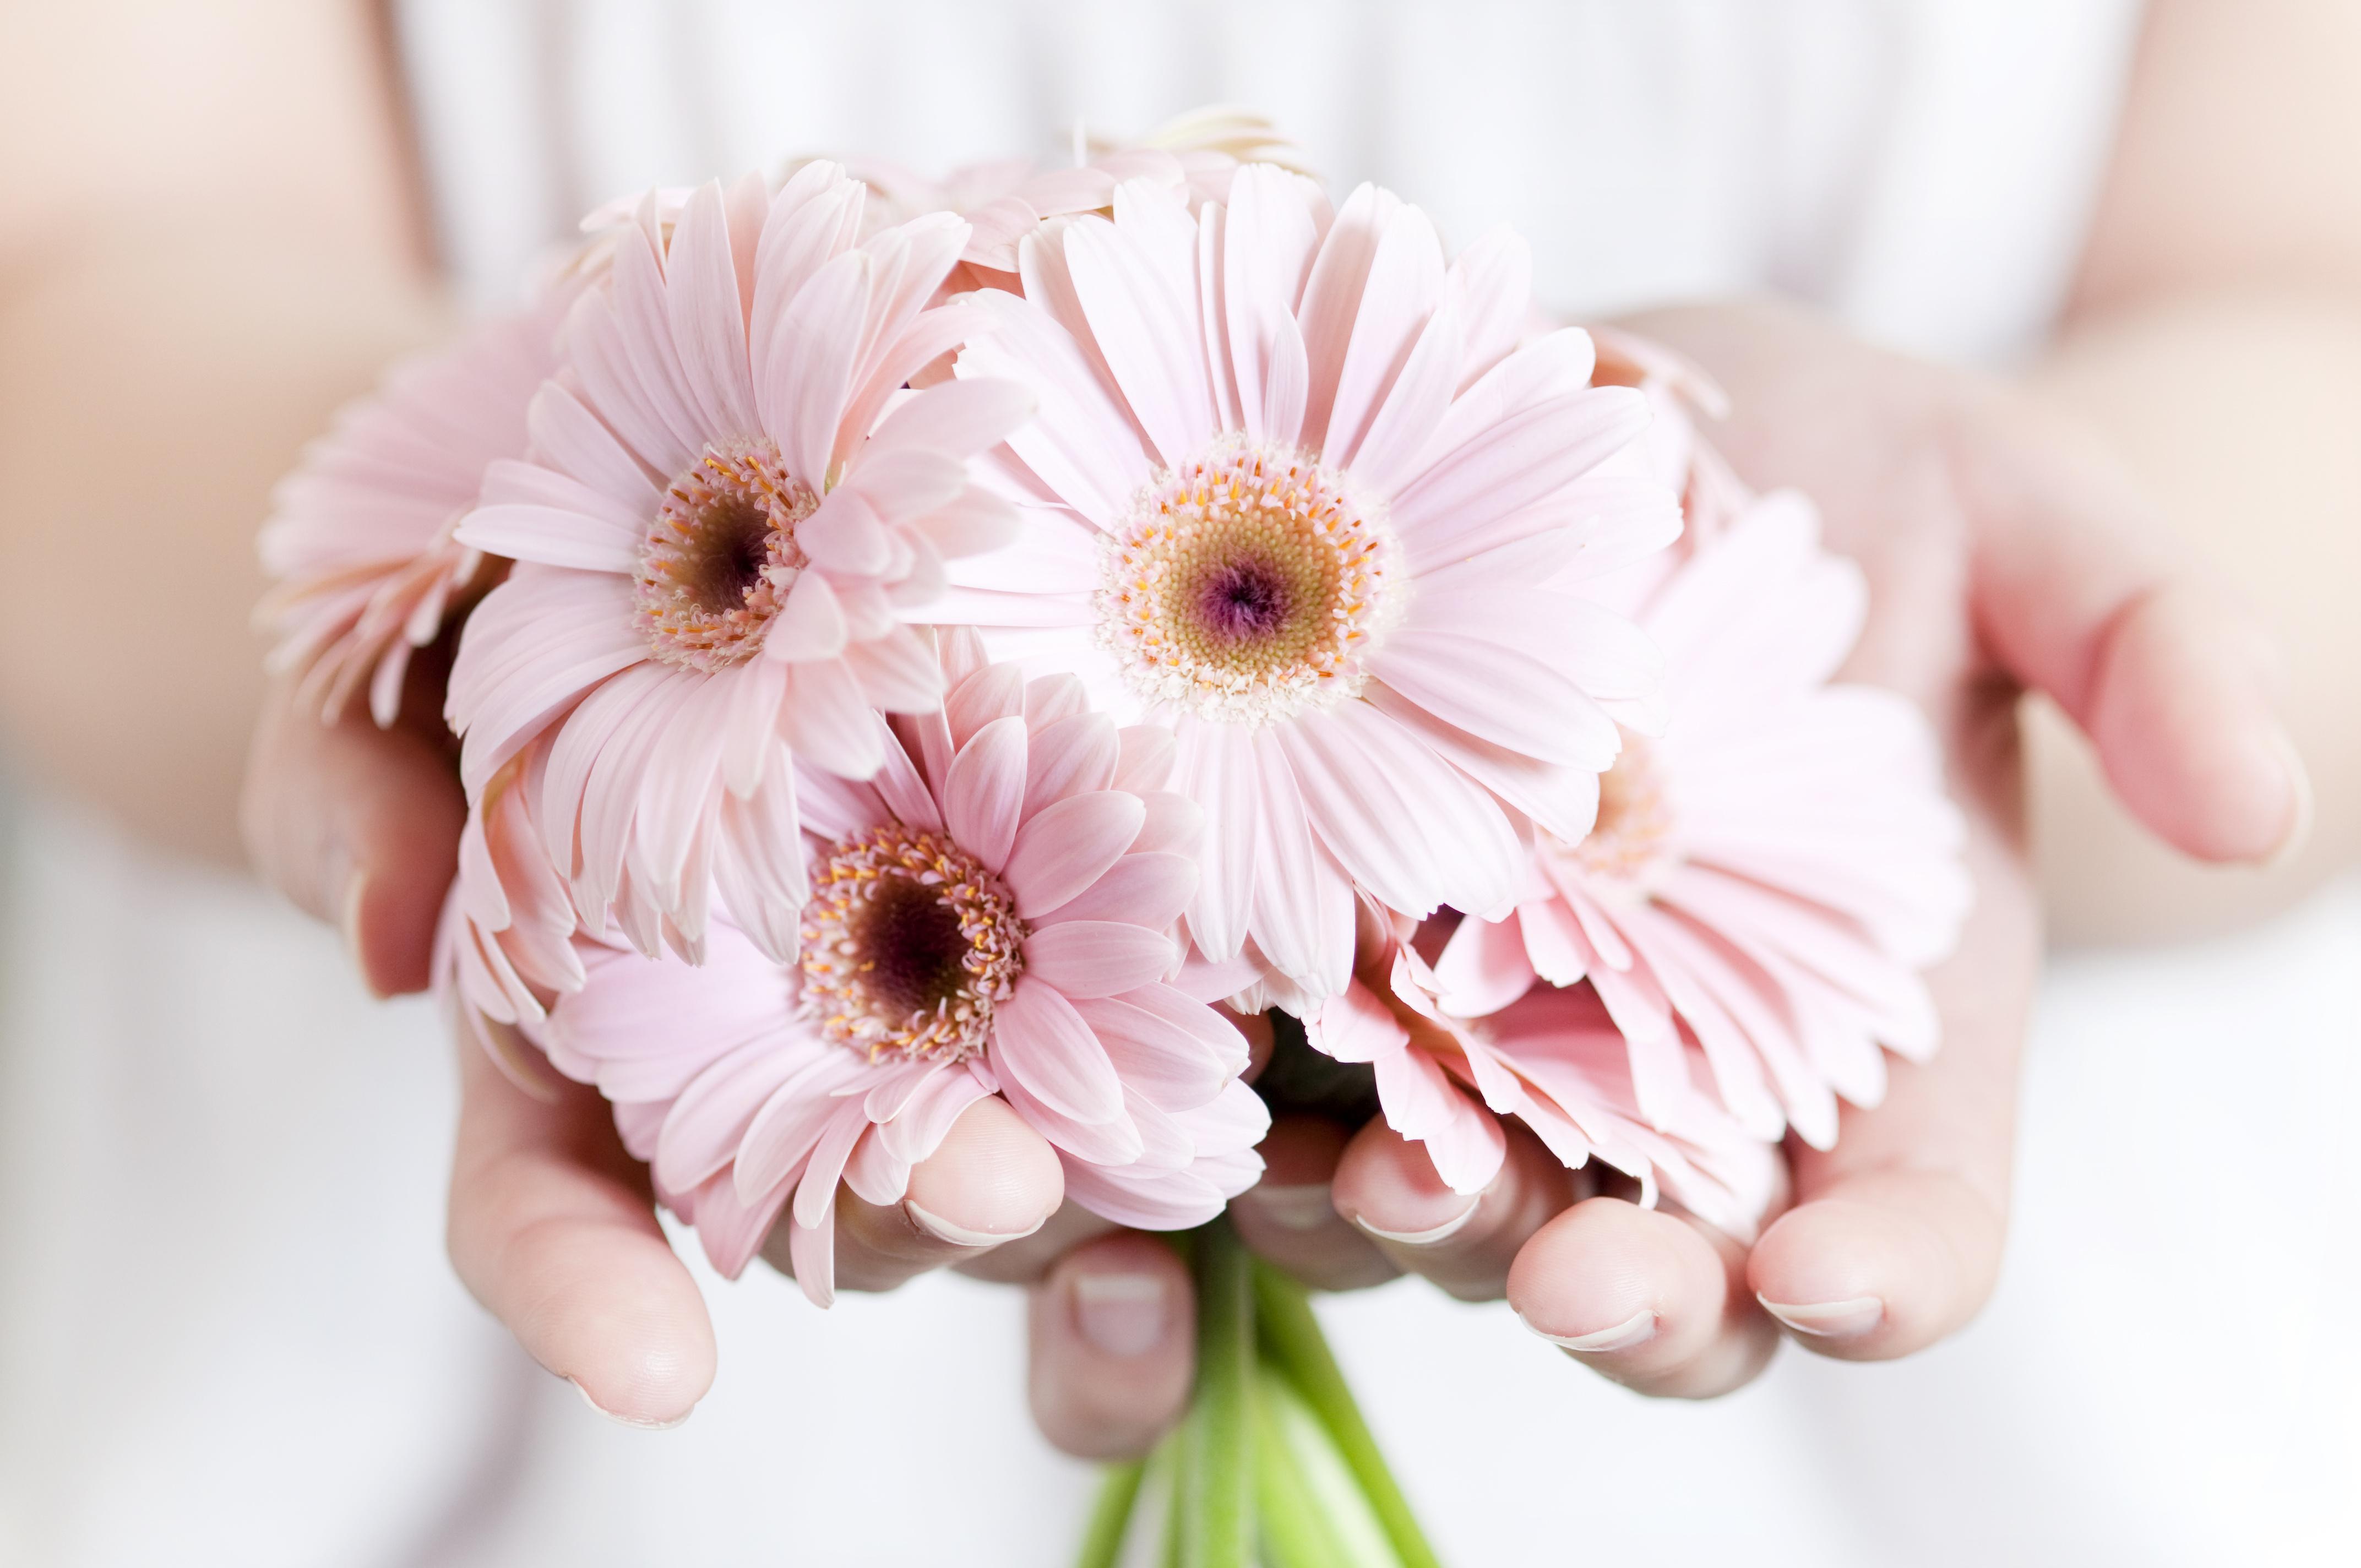 Цветы в руках — Flowers in hands